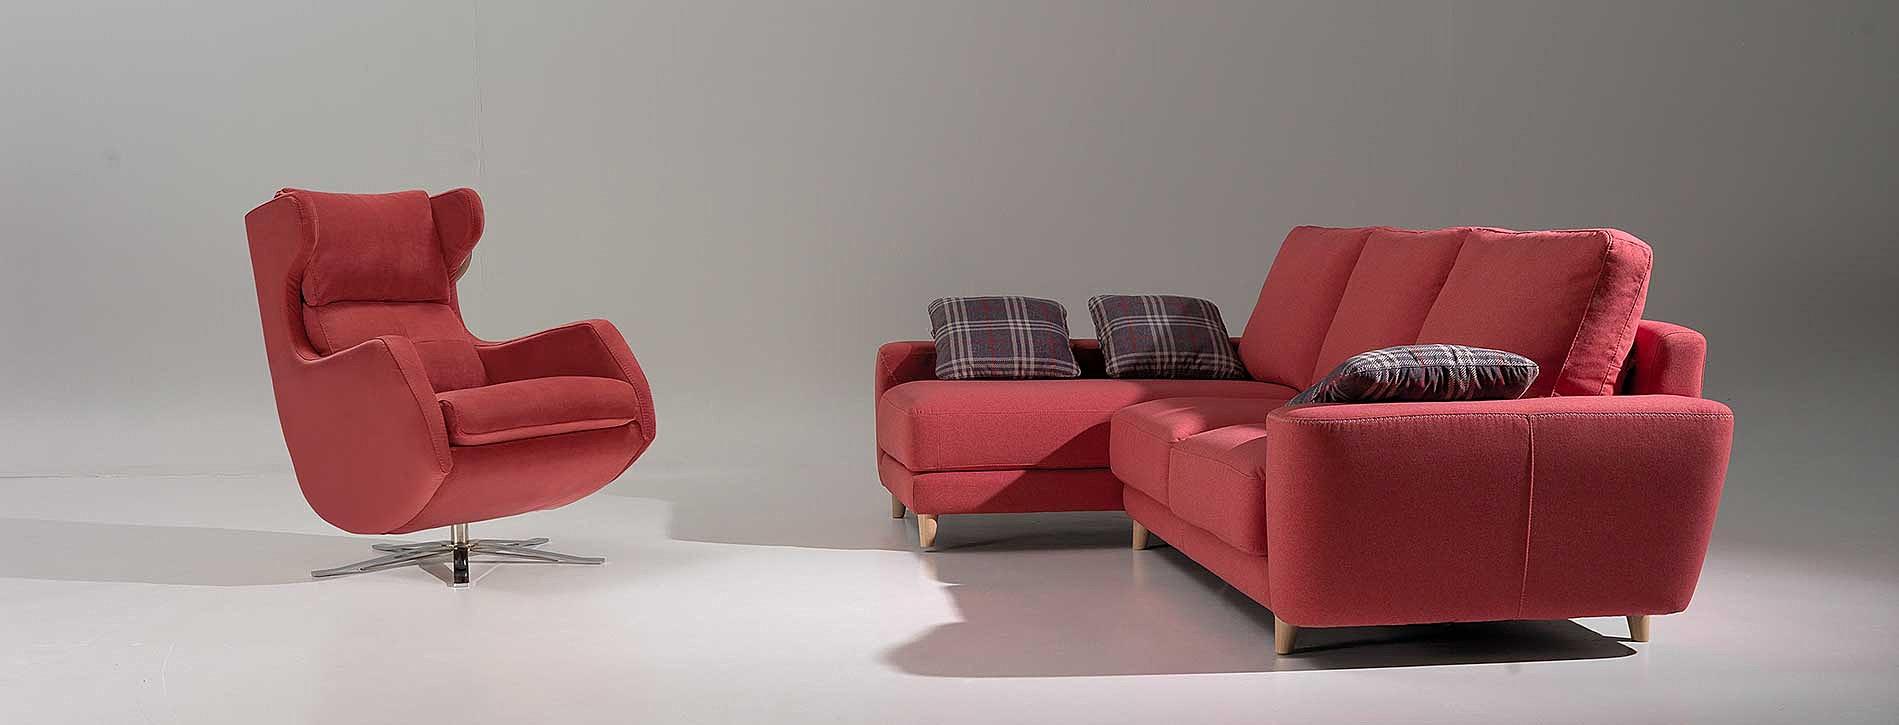 Big sofass marbella sof s en marbella colchones en marbella irina - Sofas en marbella ...